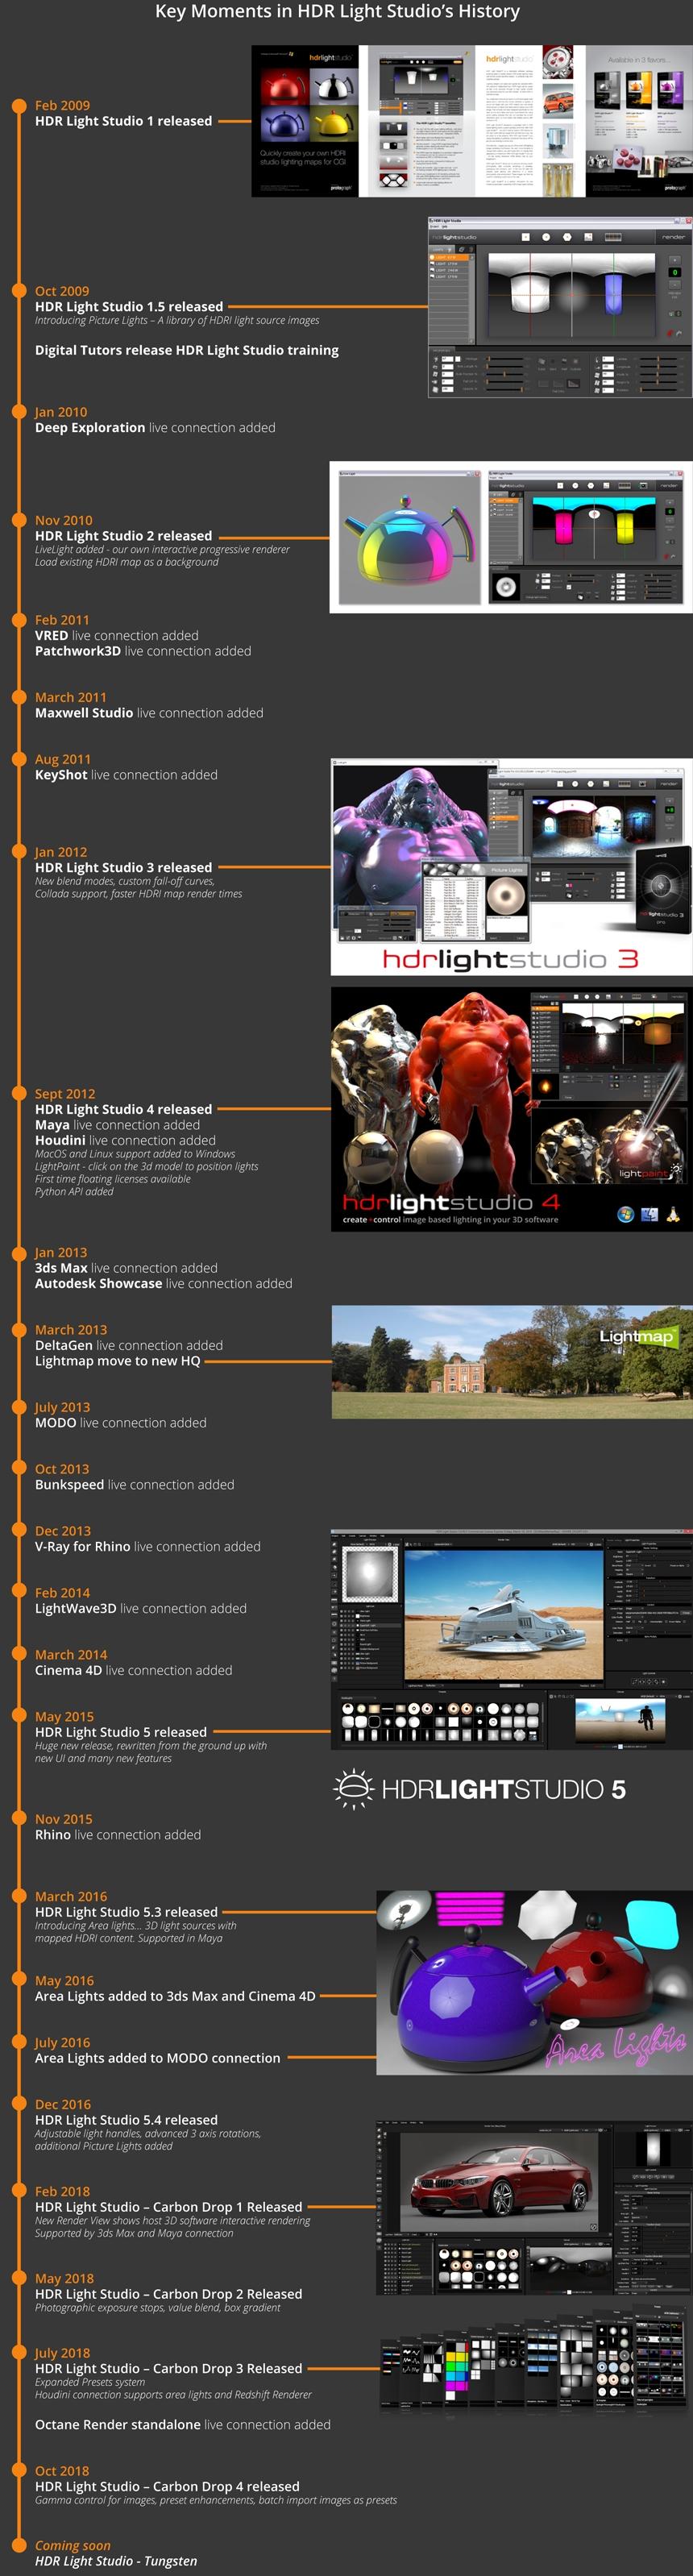 Time-line of HDR Light Studio innovations